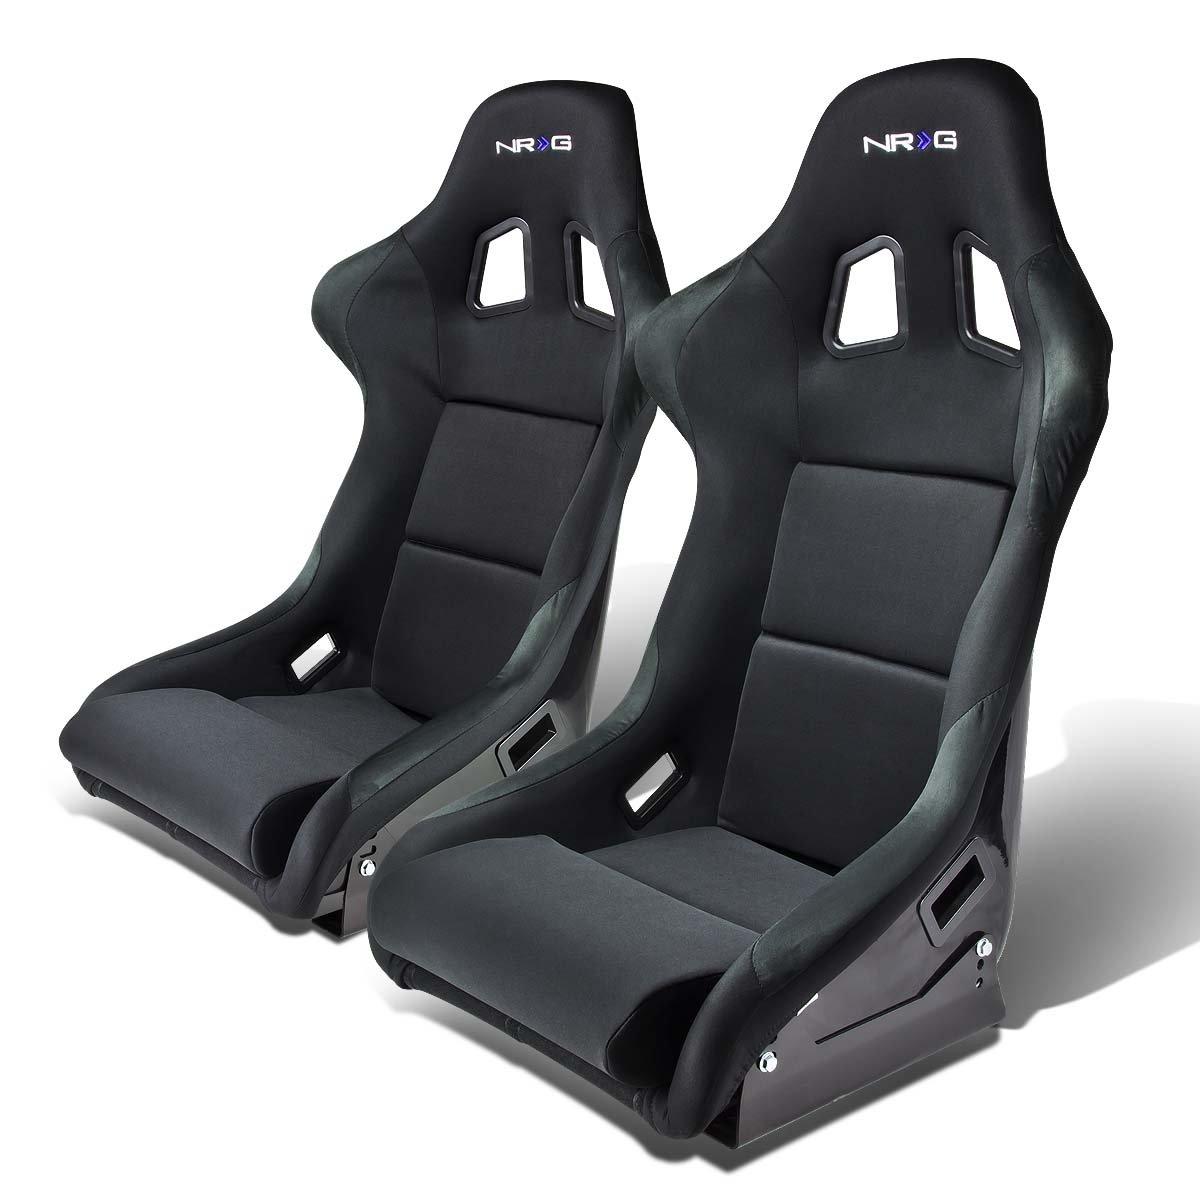 NRG FRP-310 Pair of Fiber Glass Bucket Style Racing Seat w/Adjustable Mounting Bracket (Black)